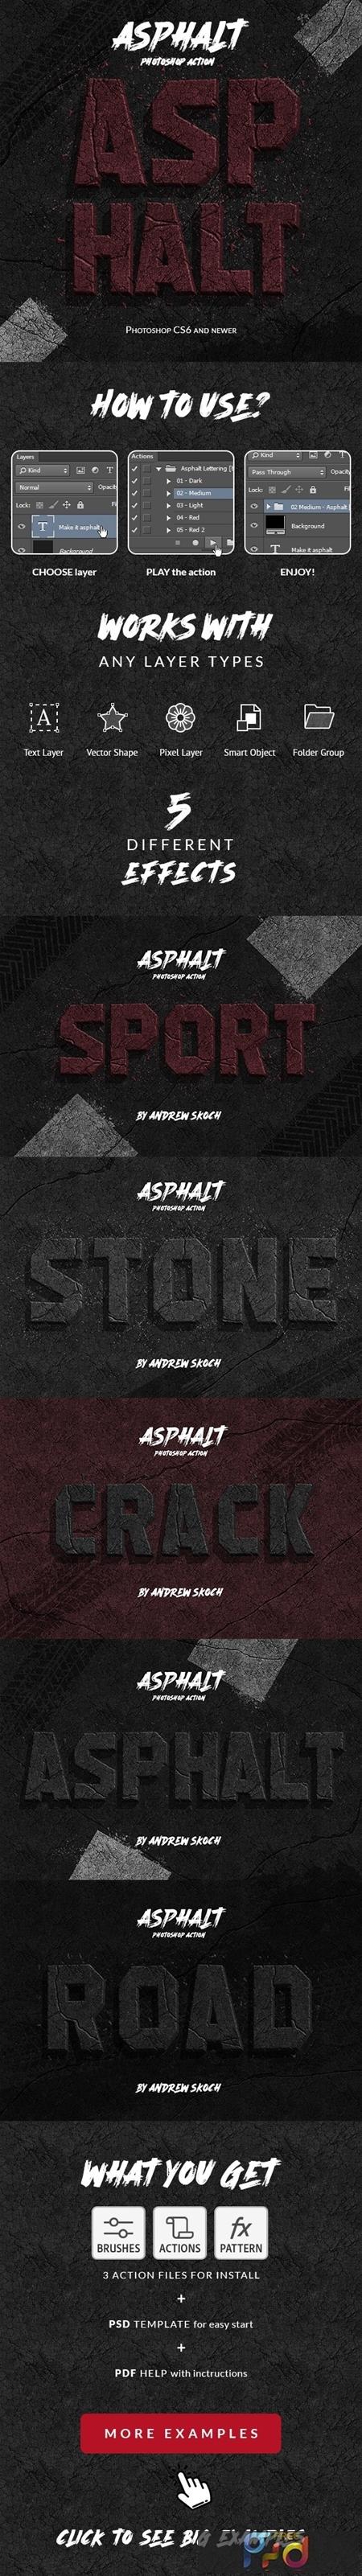 Asphalt - Photoshop Action 26088344 1